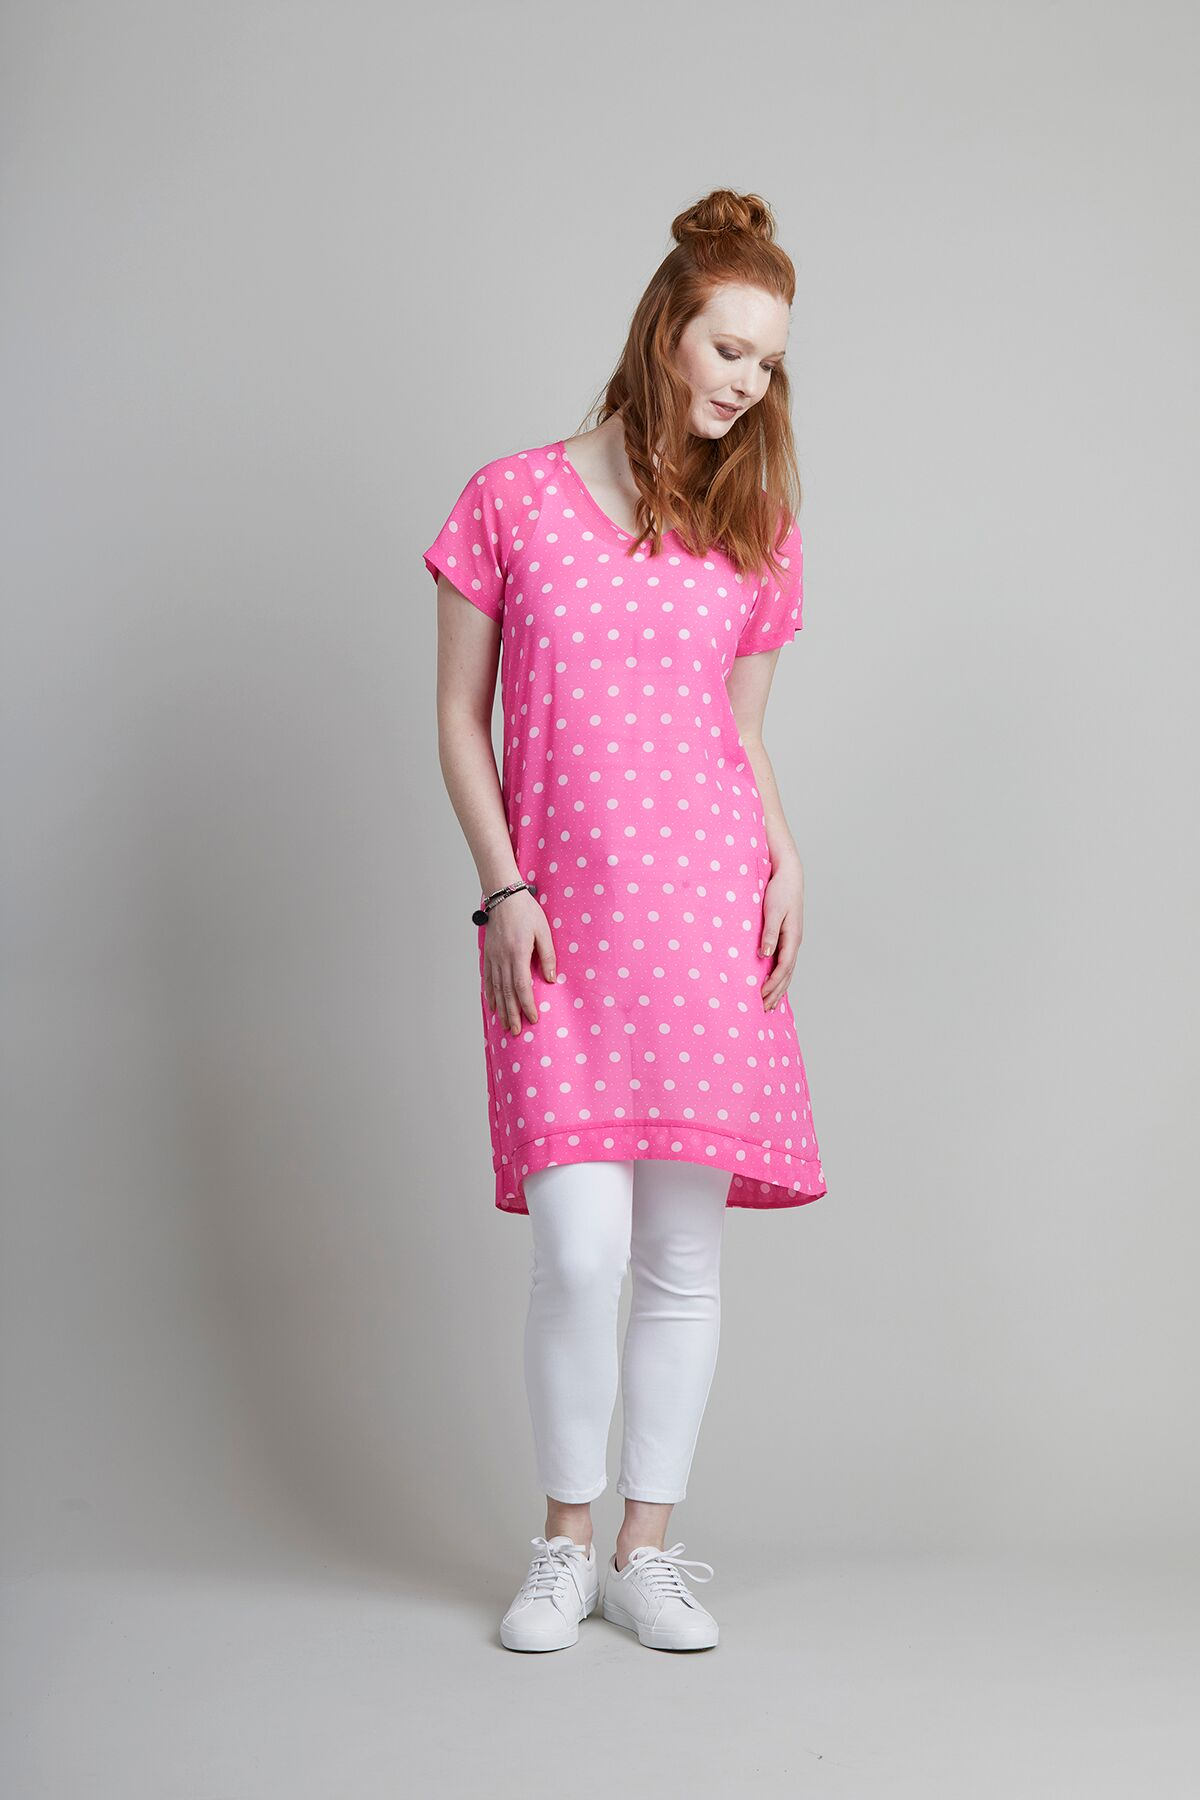 2b761f75a5 Memo Dress S/S V Neck Chiffon Cotton - Women's Dresses | Yarntons ...